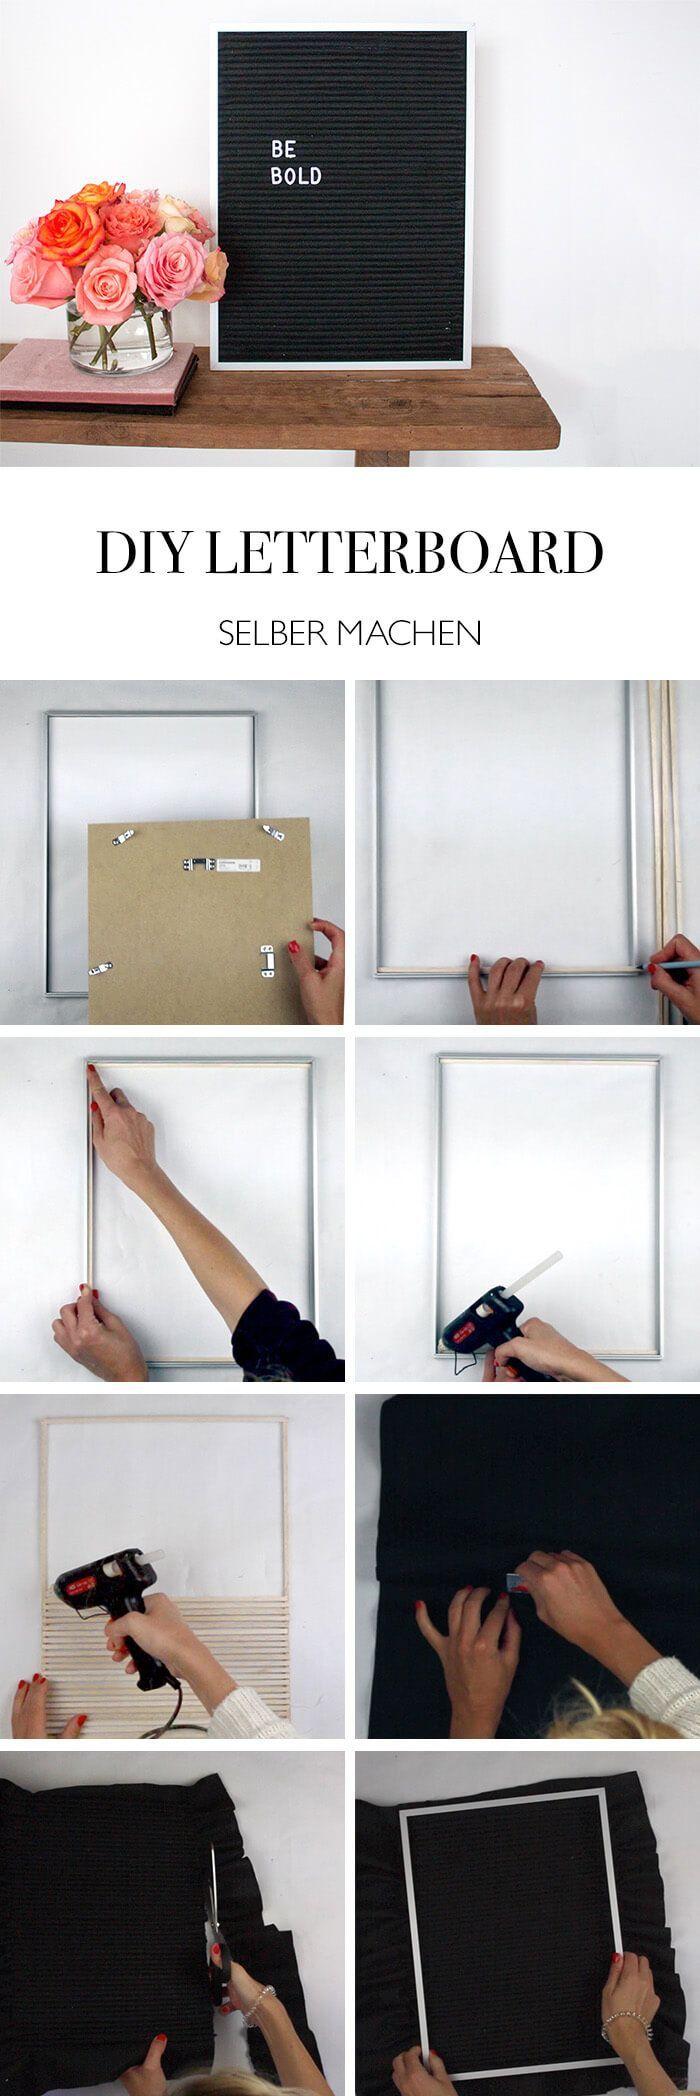 diy letterboard – buchstaben tafel selber machen | diy inspiration